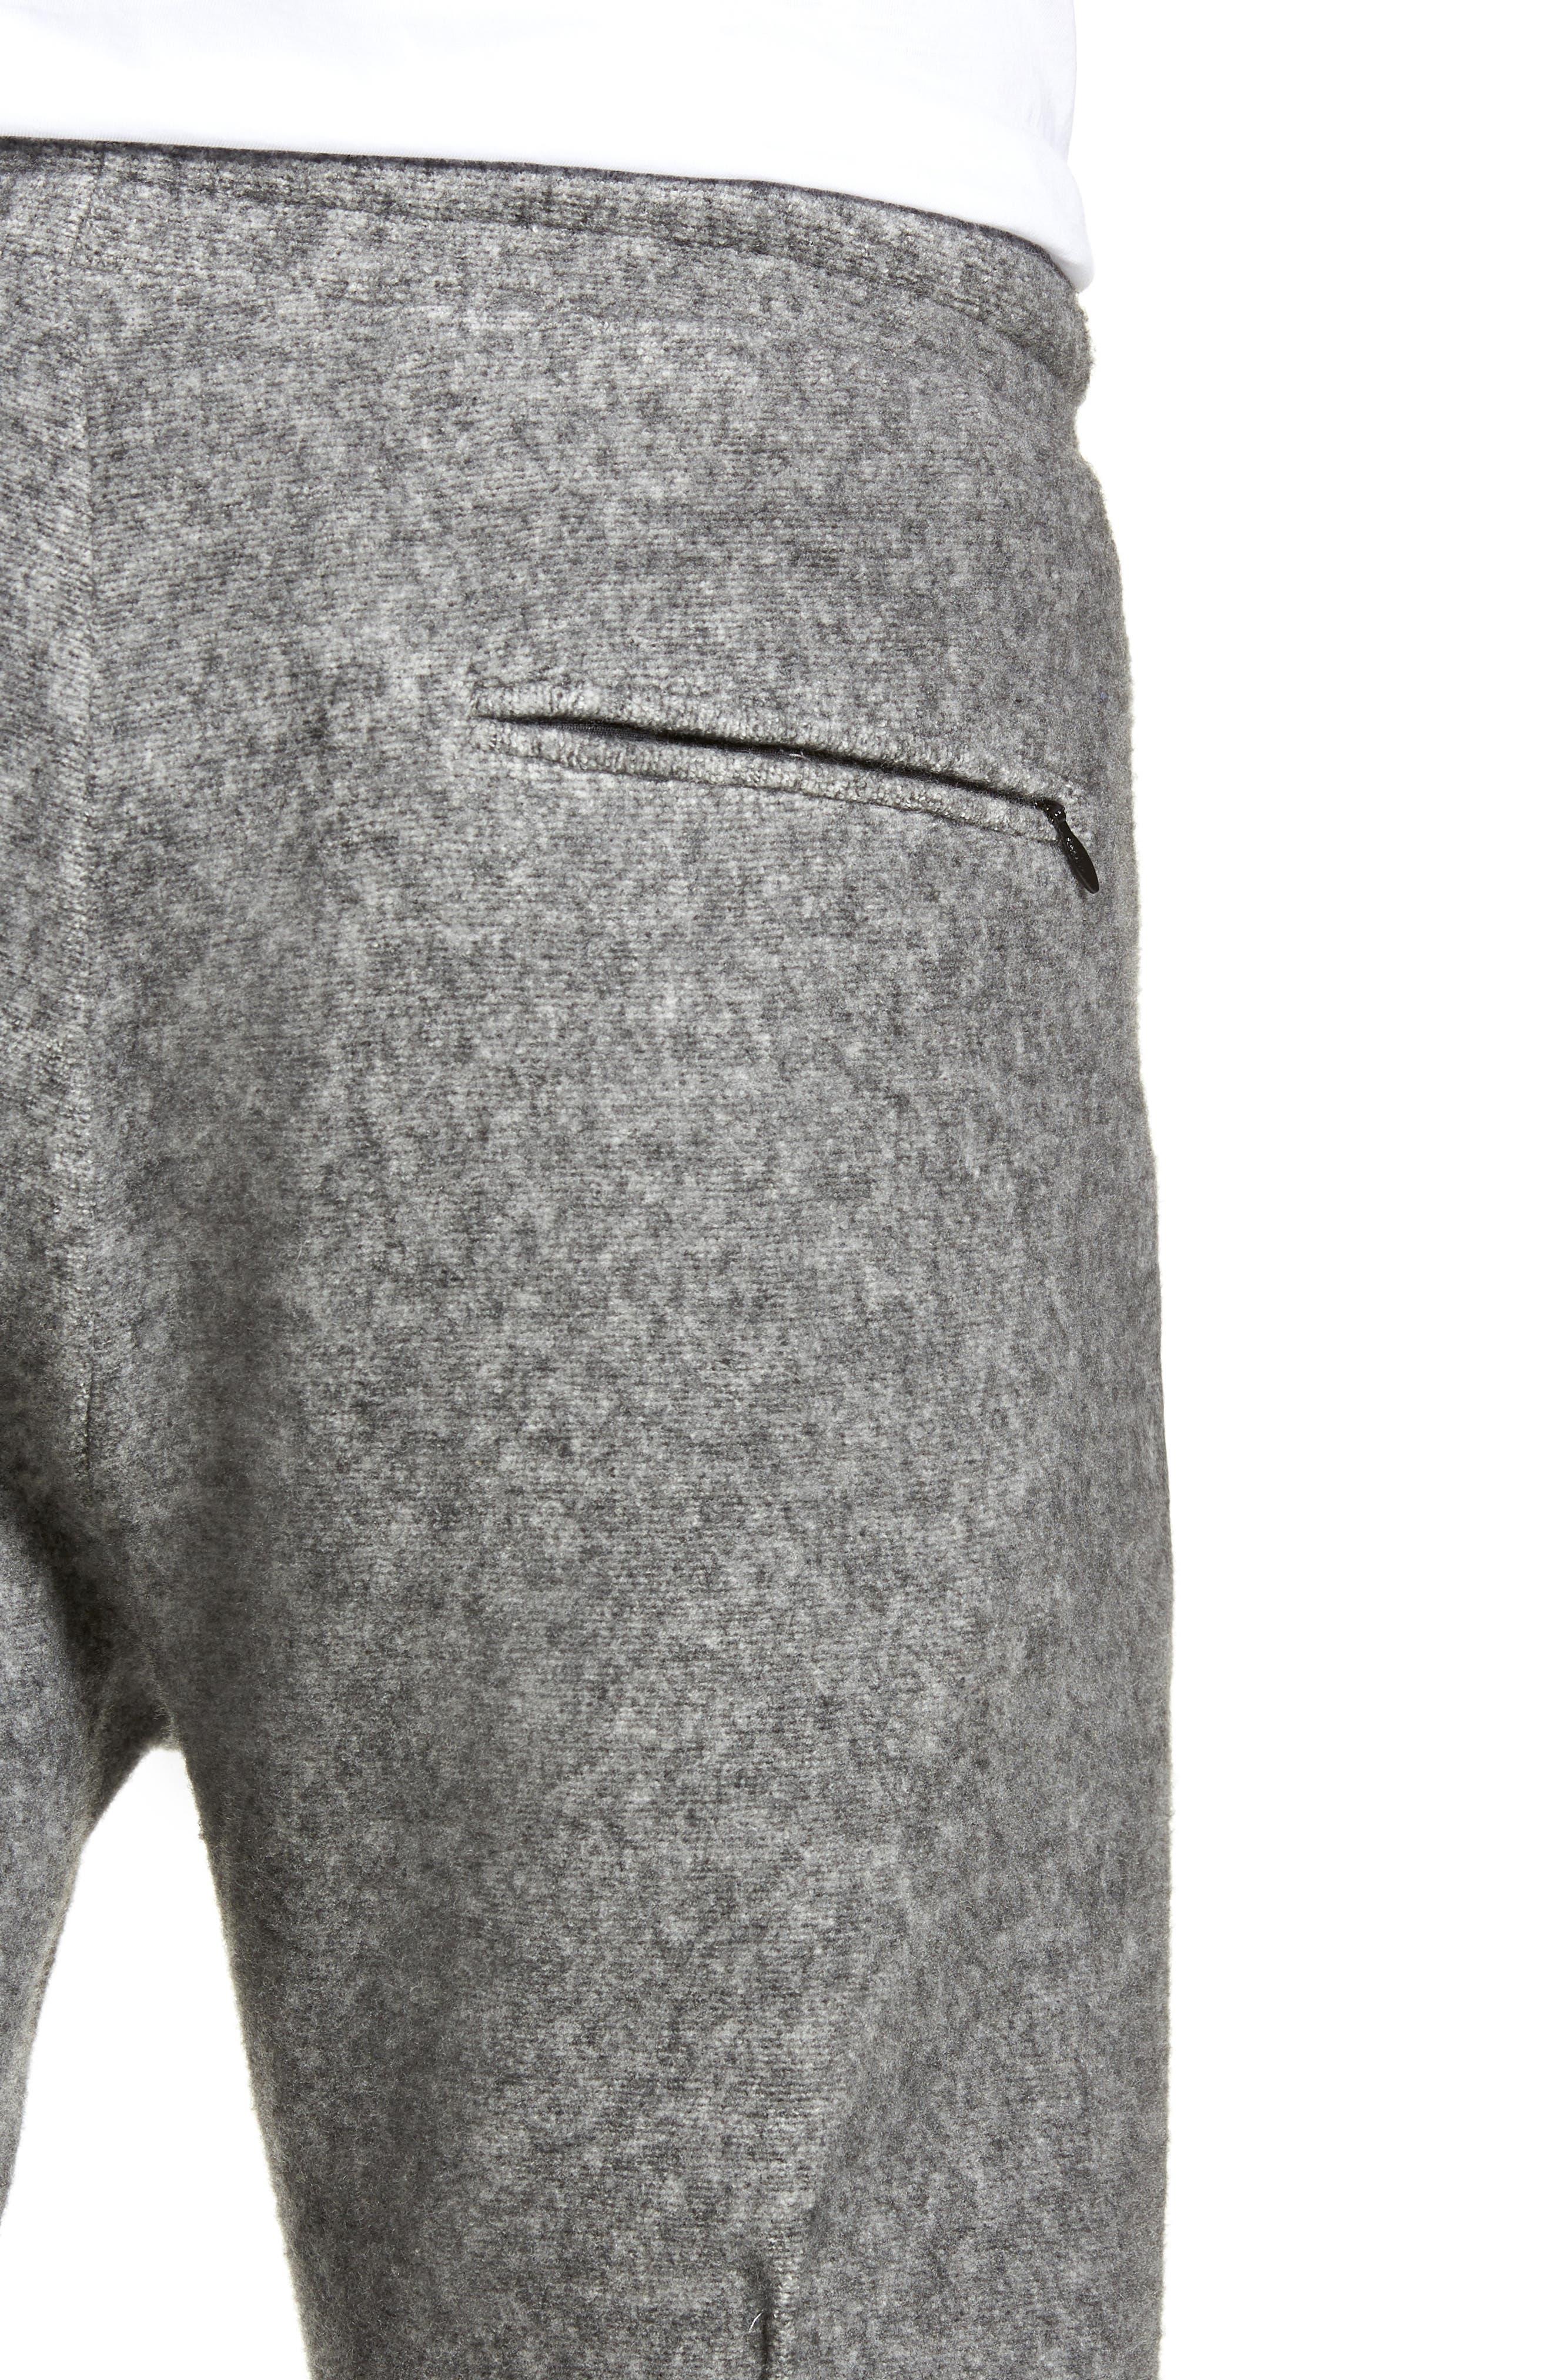 Maddux Slim Fit Jogger Pants,                             Alternate thumbnail 4, color,                             HEATHER GREY